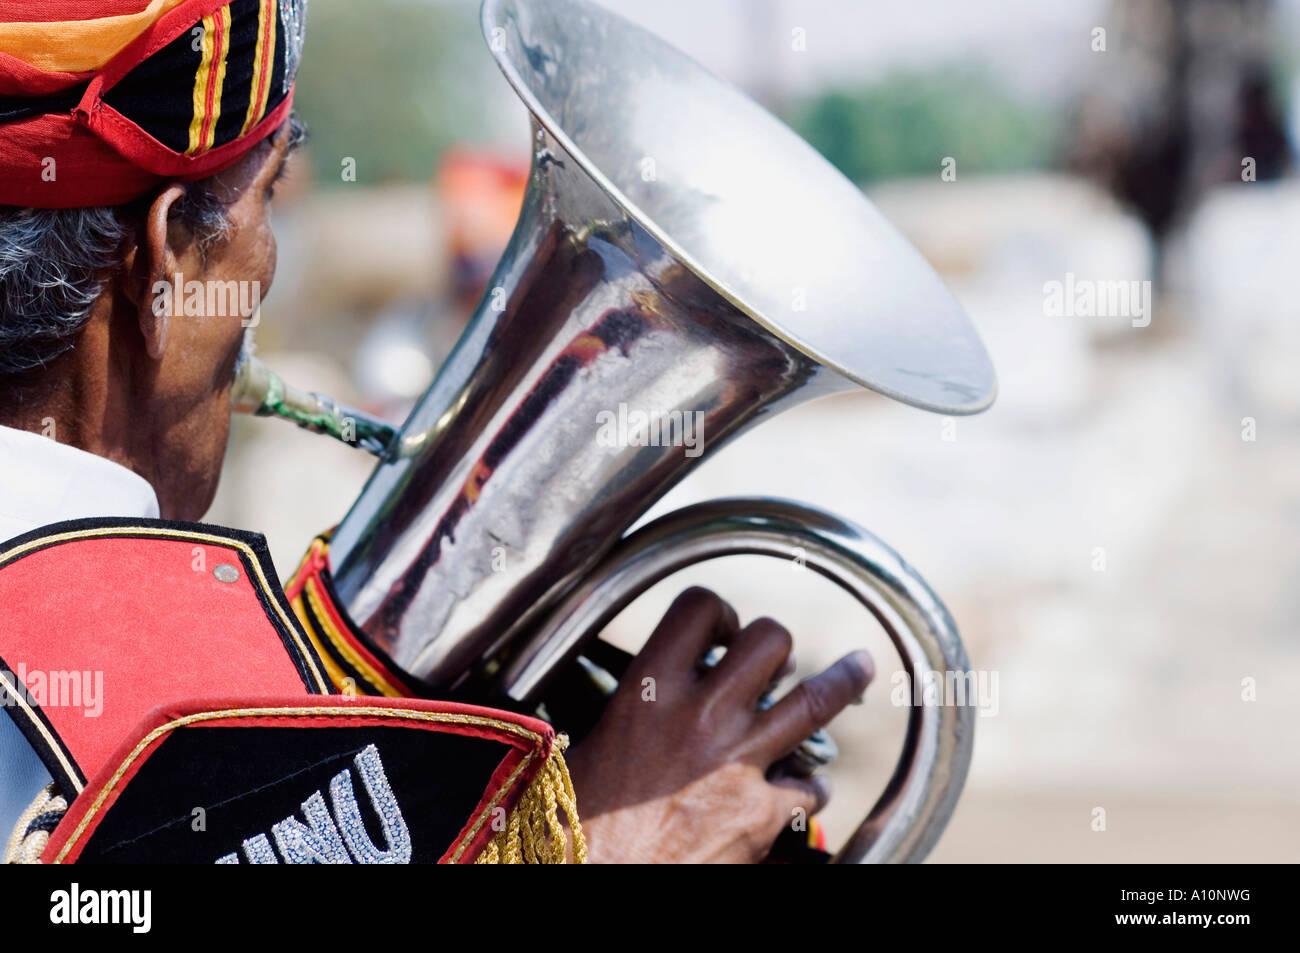 Vista trasera de un hombre tocando la tuba, Jaipur, Rajasthan, India Imagen De Stock